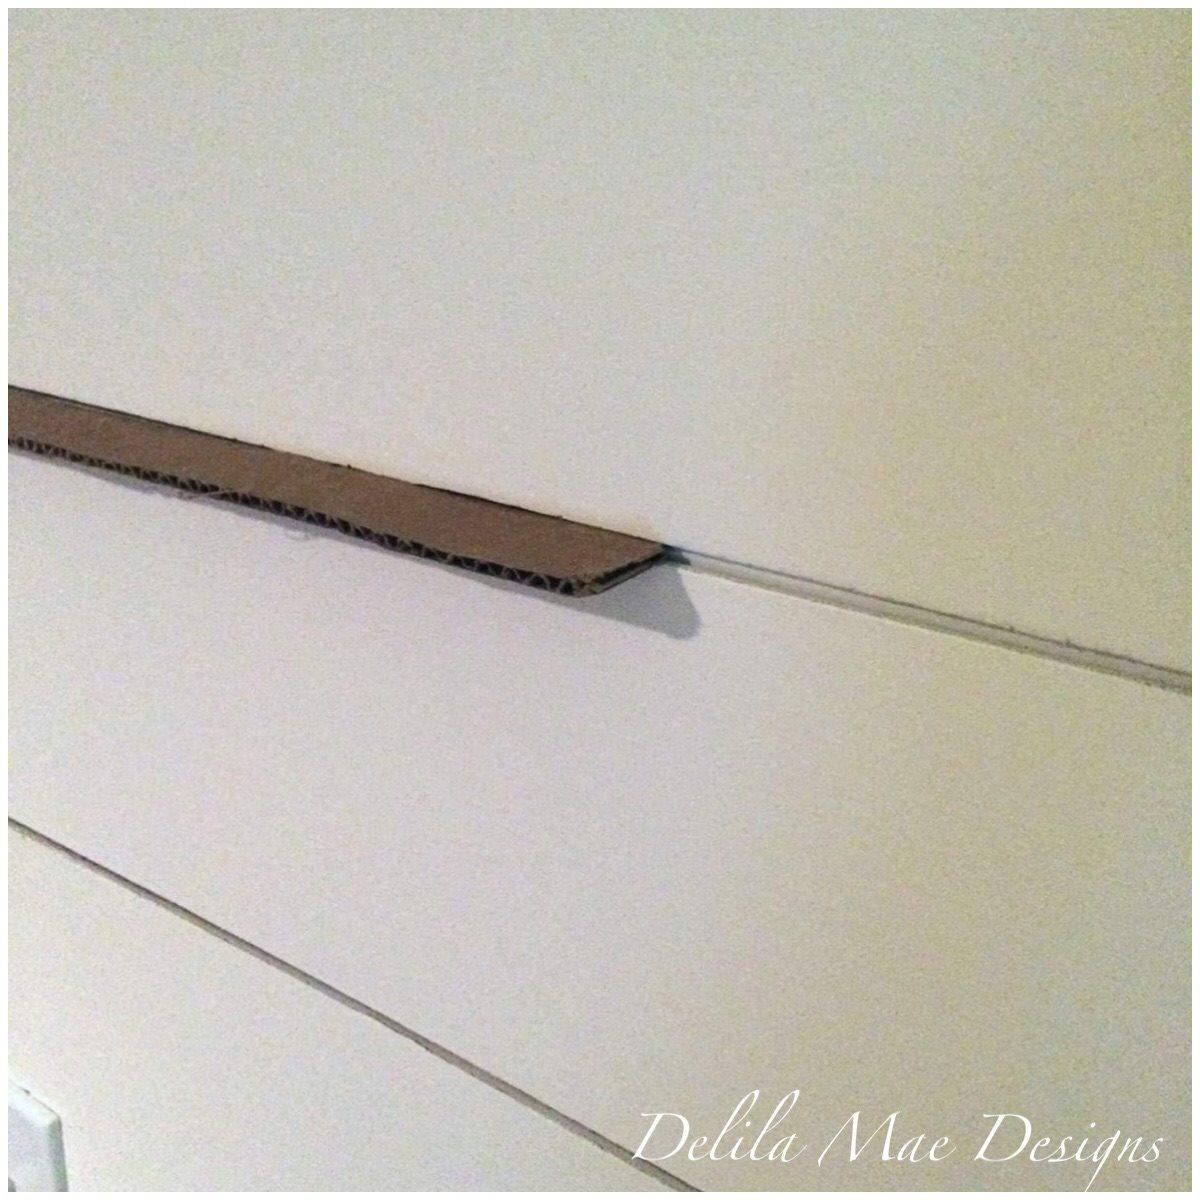 Delila Mae Designs: DIY Shiplap Wall